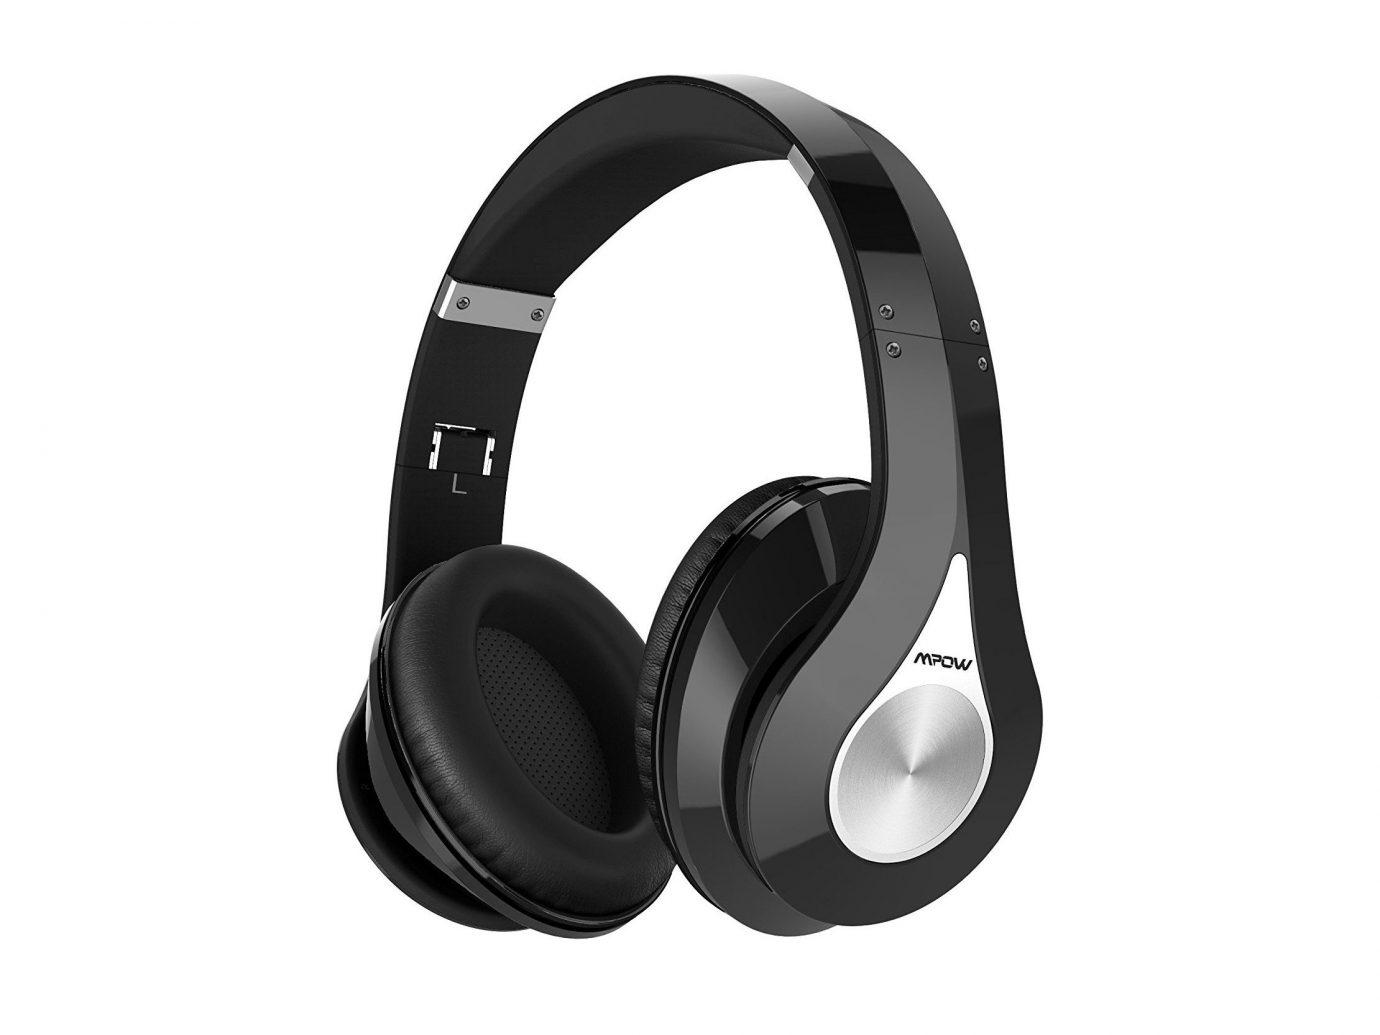 Packing Tips Travel Shop Travel Tips earphone electronics headphones technology audio equipment audio electronic device headset product product design